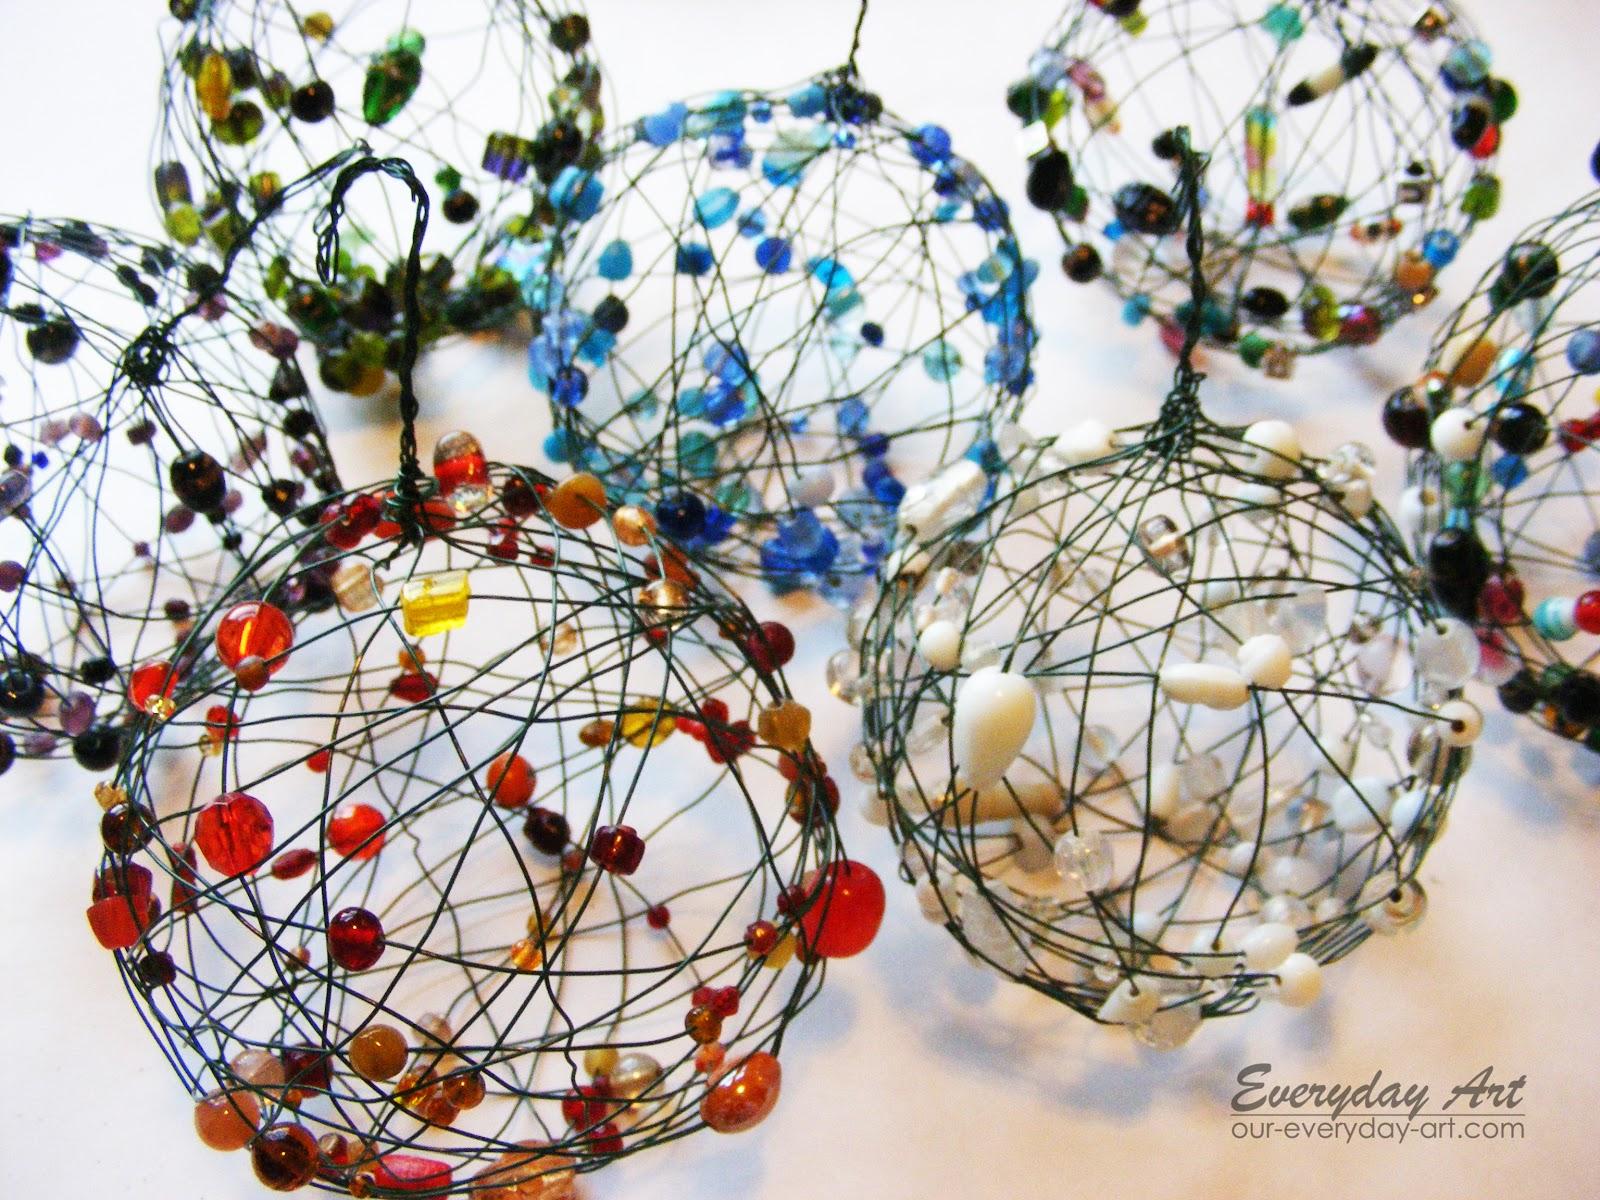 Handmade christmas ornaments with beads - Handmade Christmas Ornaments With Beads 22